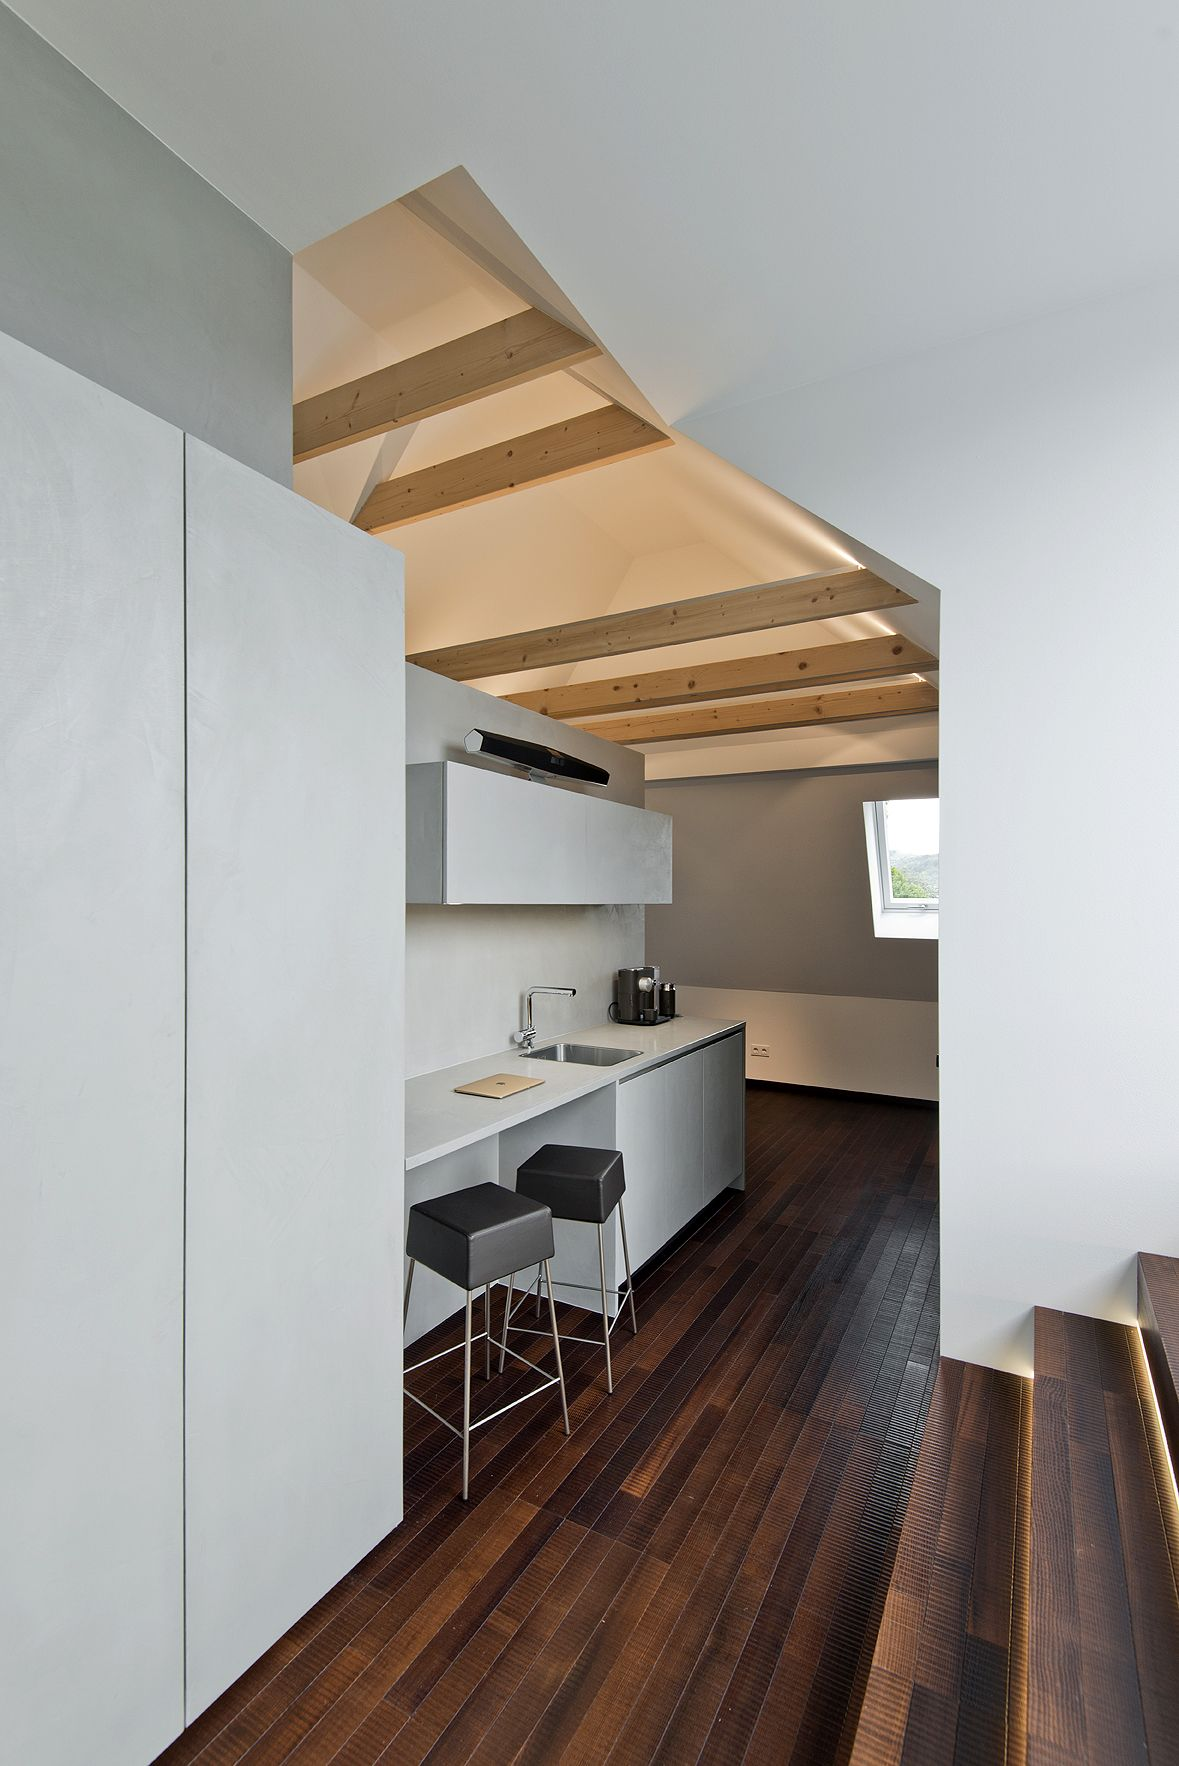 Küche_Holzboden_Beleuchtung Küche holzboden, Holzboden